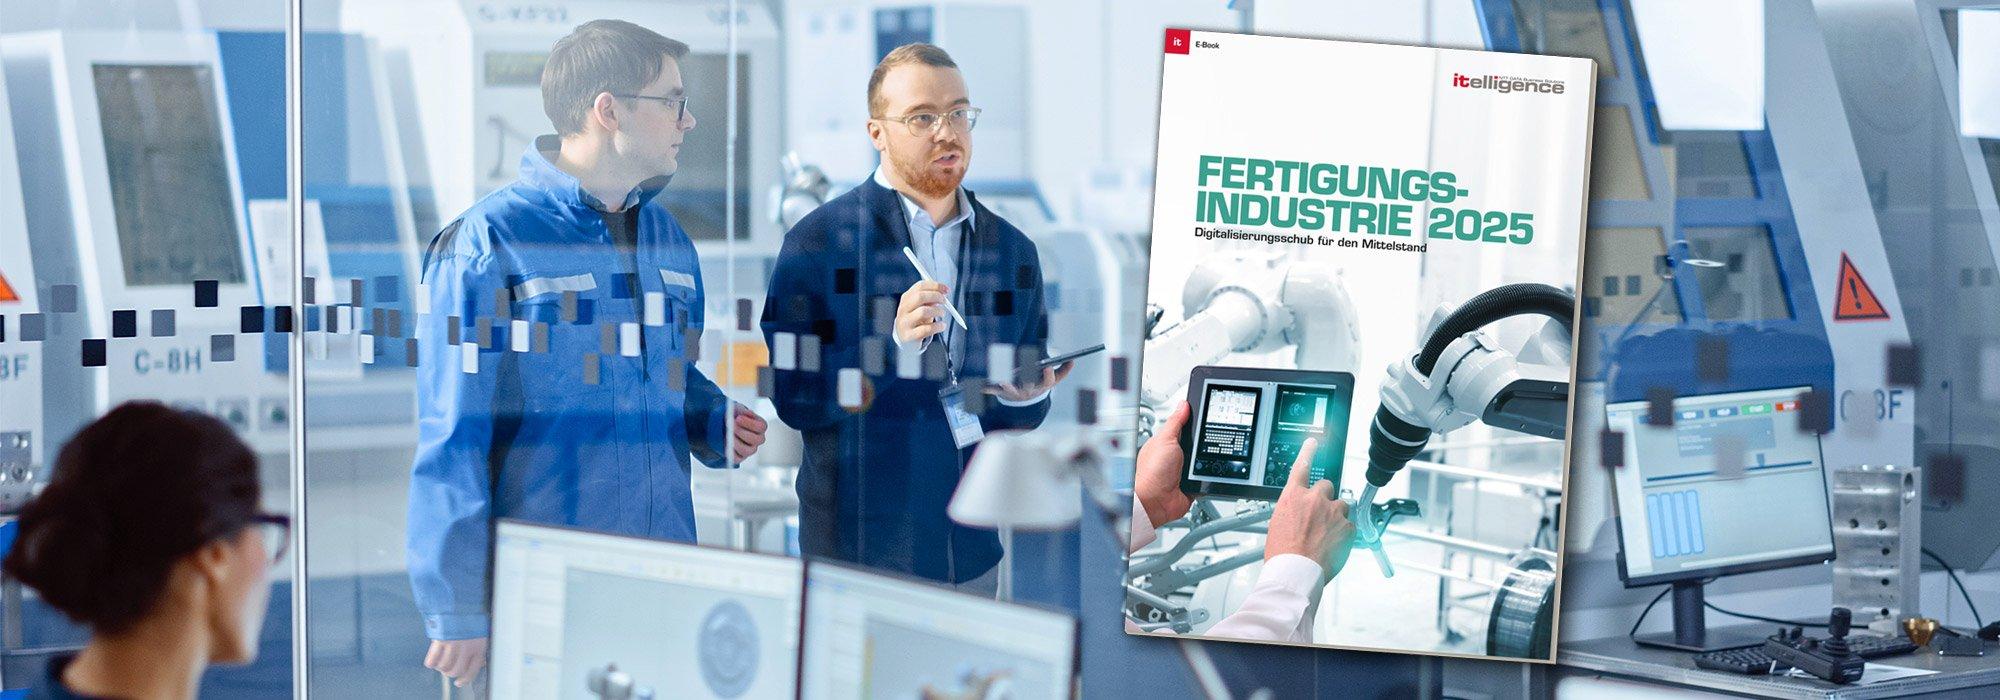 E-Book Fertigungsindustrie 2025: Digitalisierungsschub für den Mittelstand